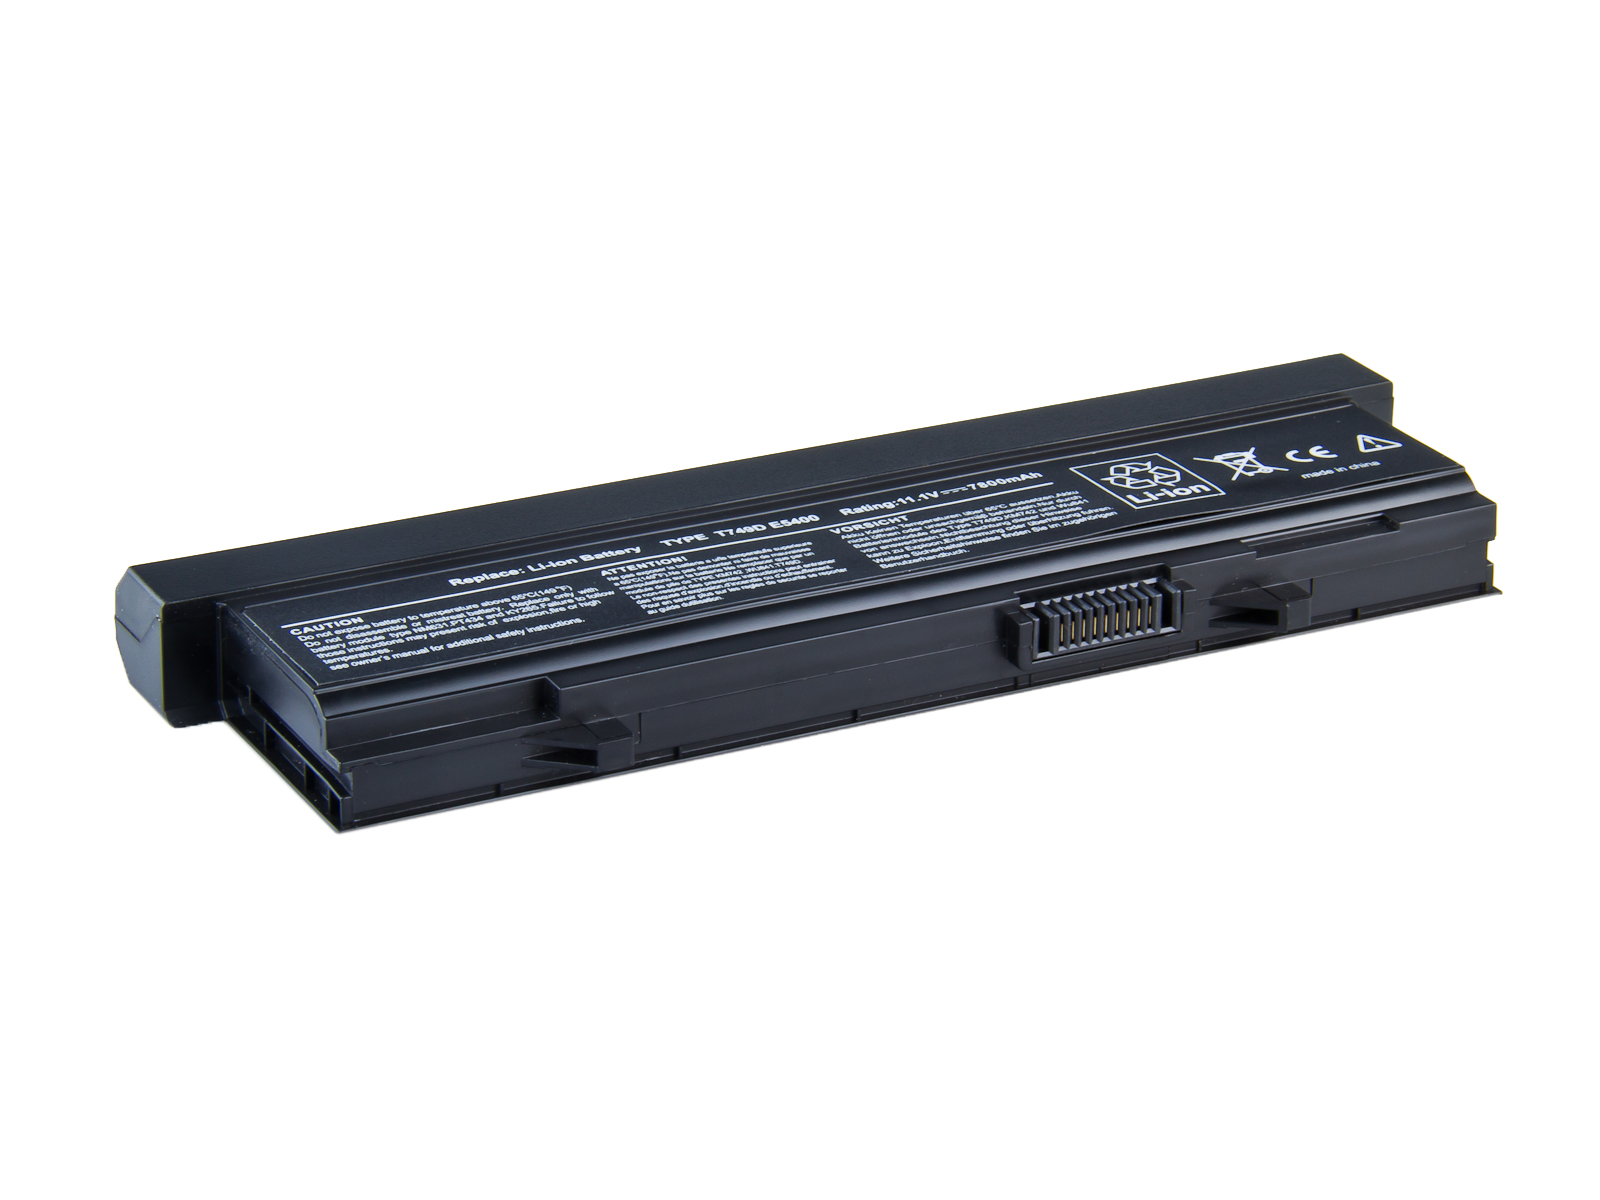 Baterie AVACOM NODE-E55H-S26 pro Dell Latitude E5500, E5400 Li-Ion 11,1V 7800mAh